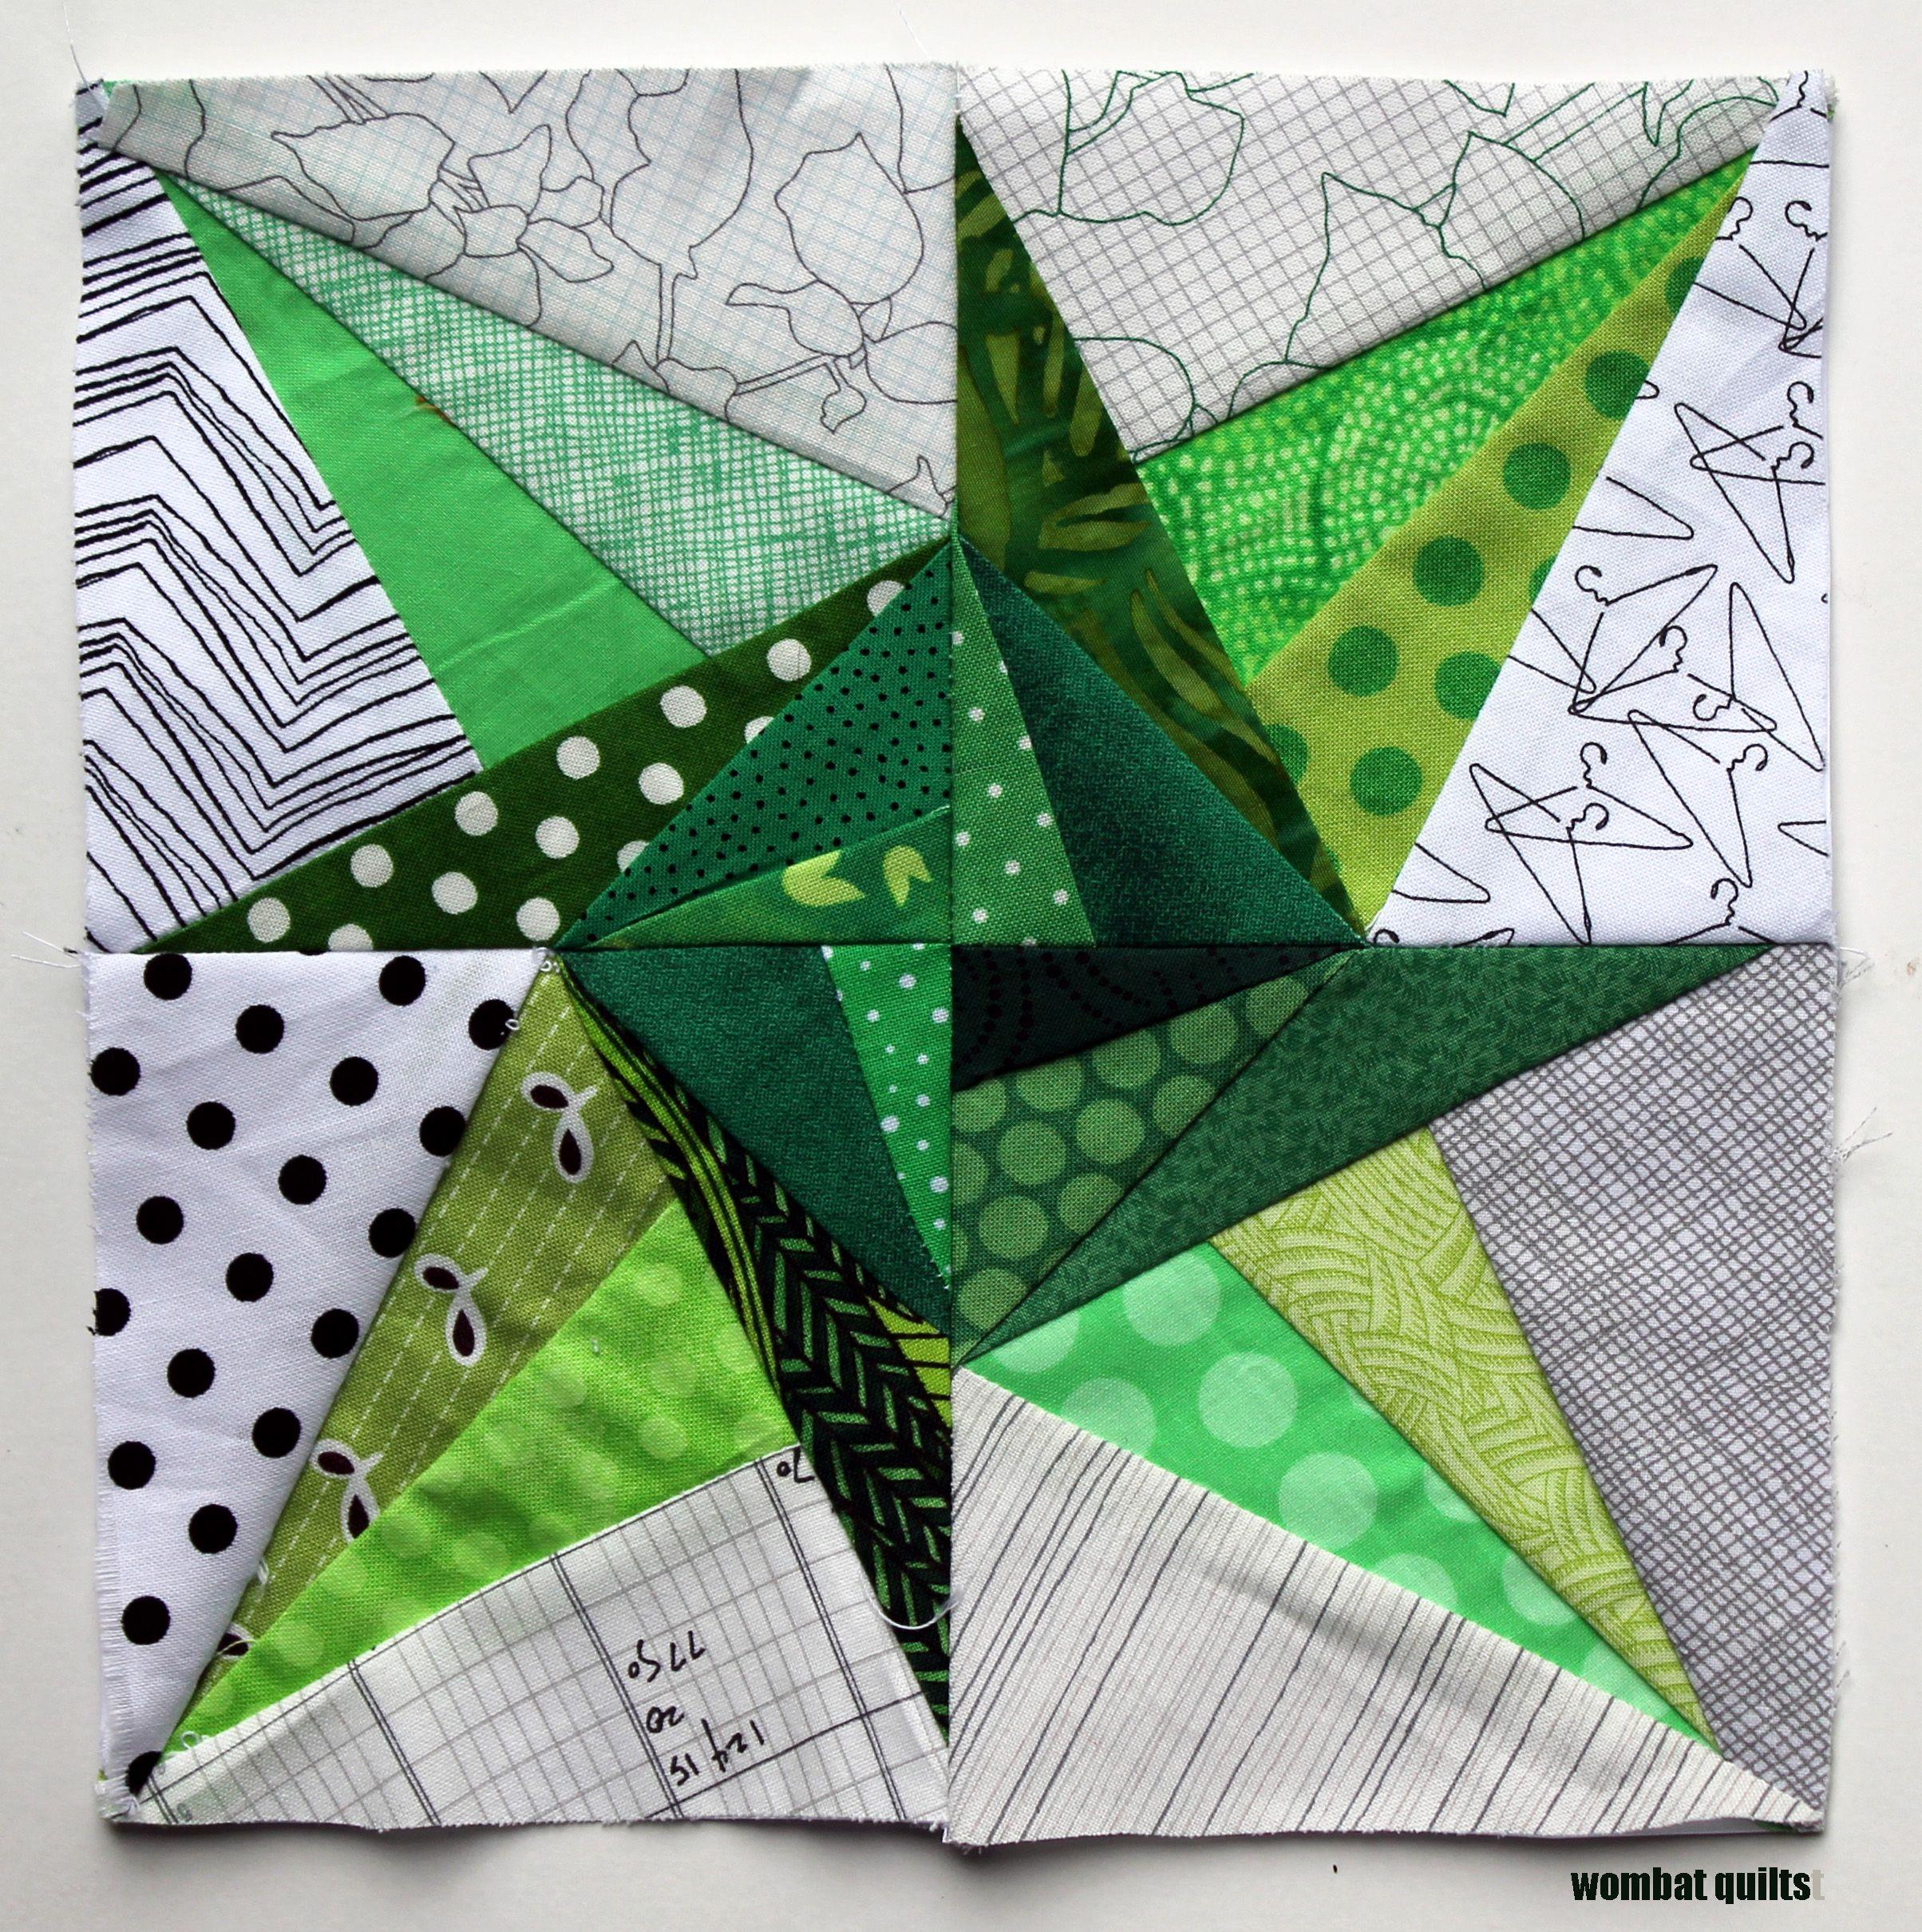 Twisting Star block @ Wombat Quilts | Quilt Block tutorials ... : twisted star quilt block - Adamdwight.com